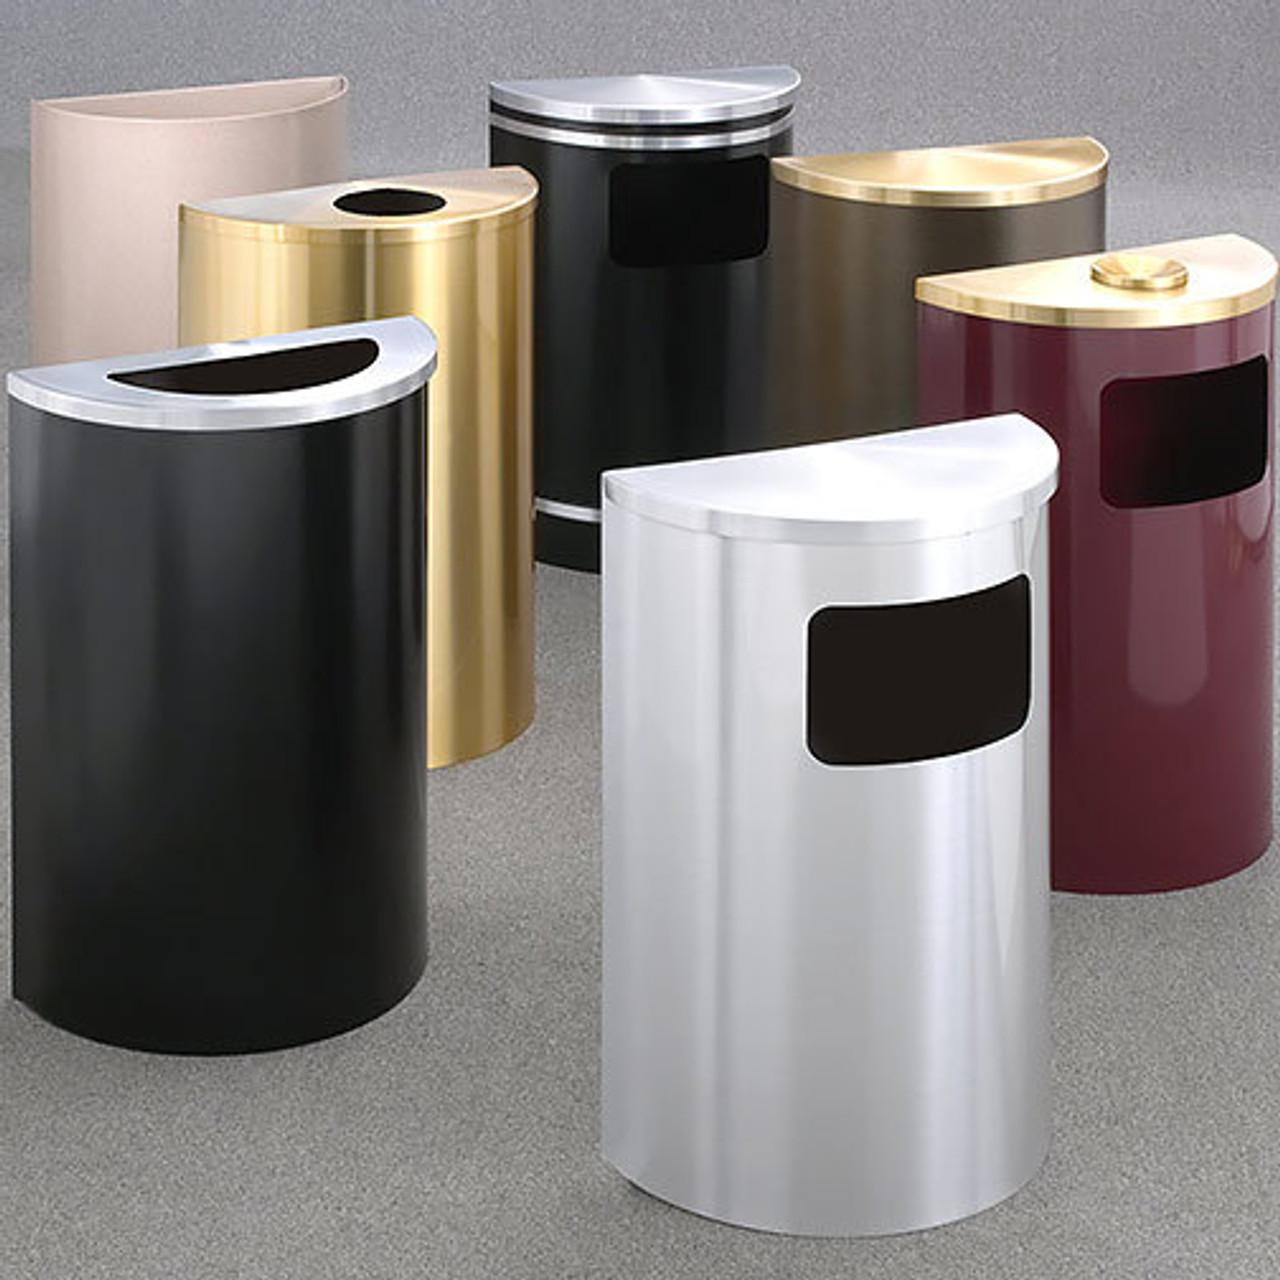 Glaro Profile Trash Cans